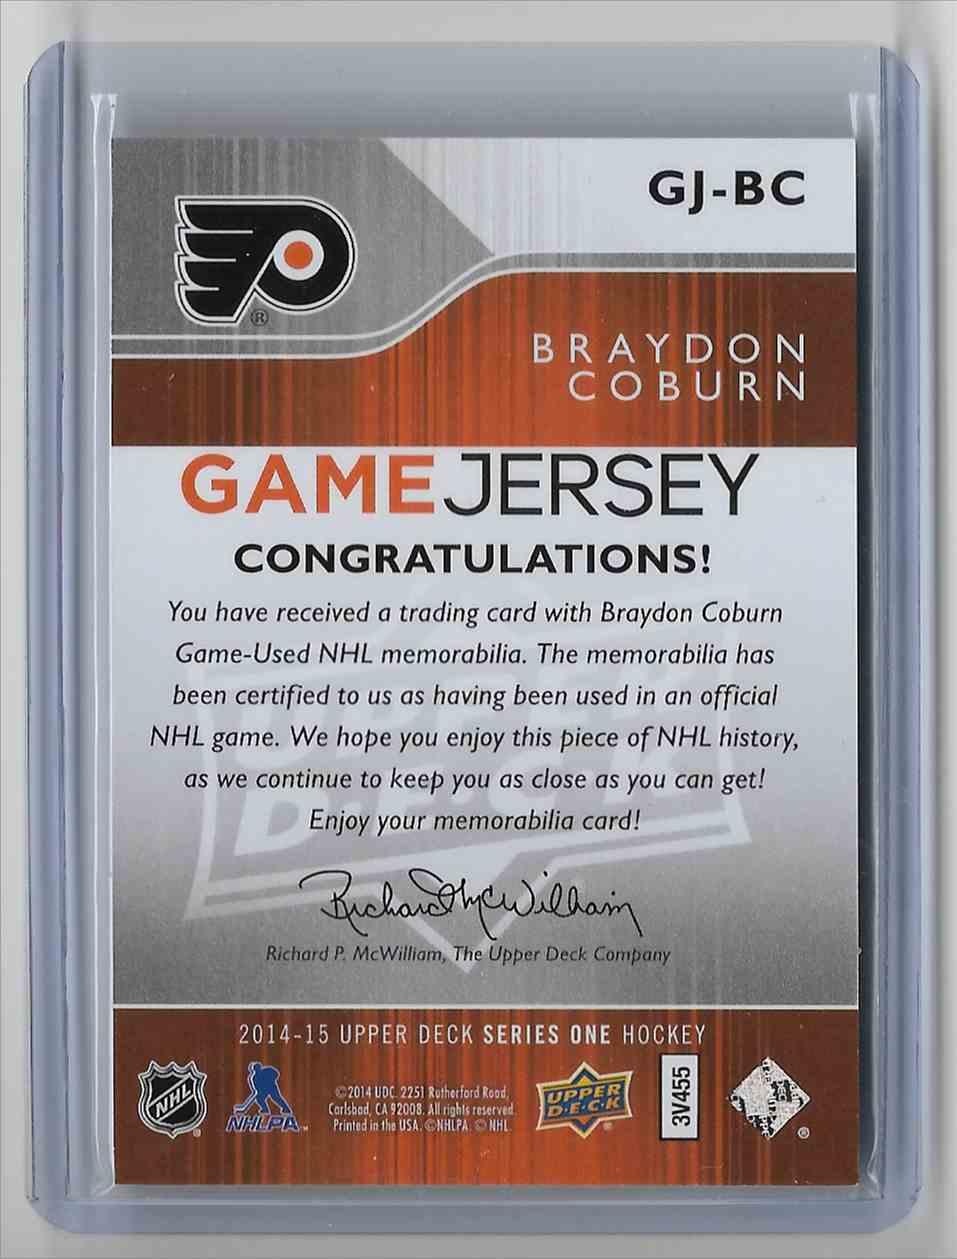 2014-15 Upper Deck Braydon Coburn #GJ-BC card back image